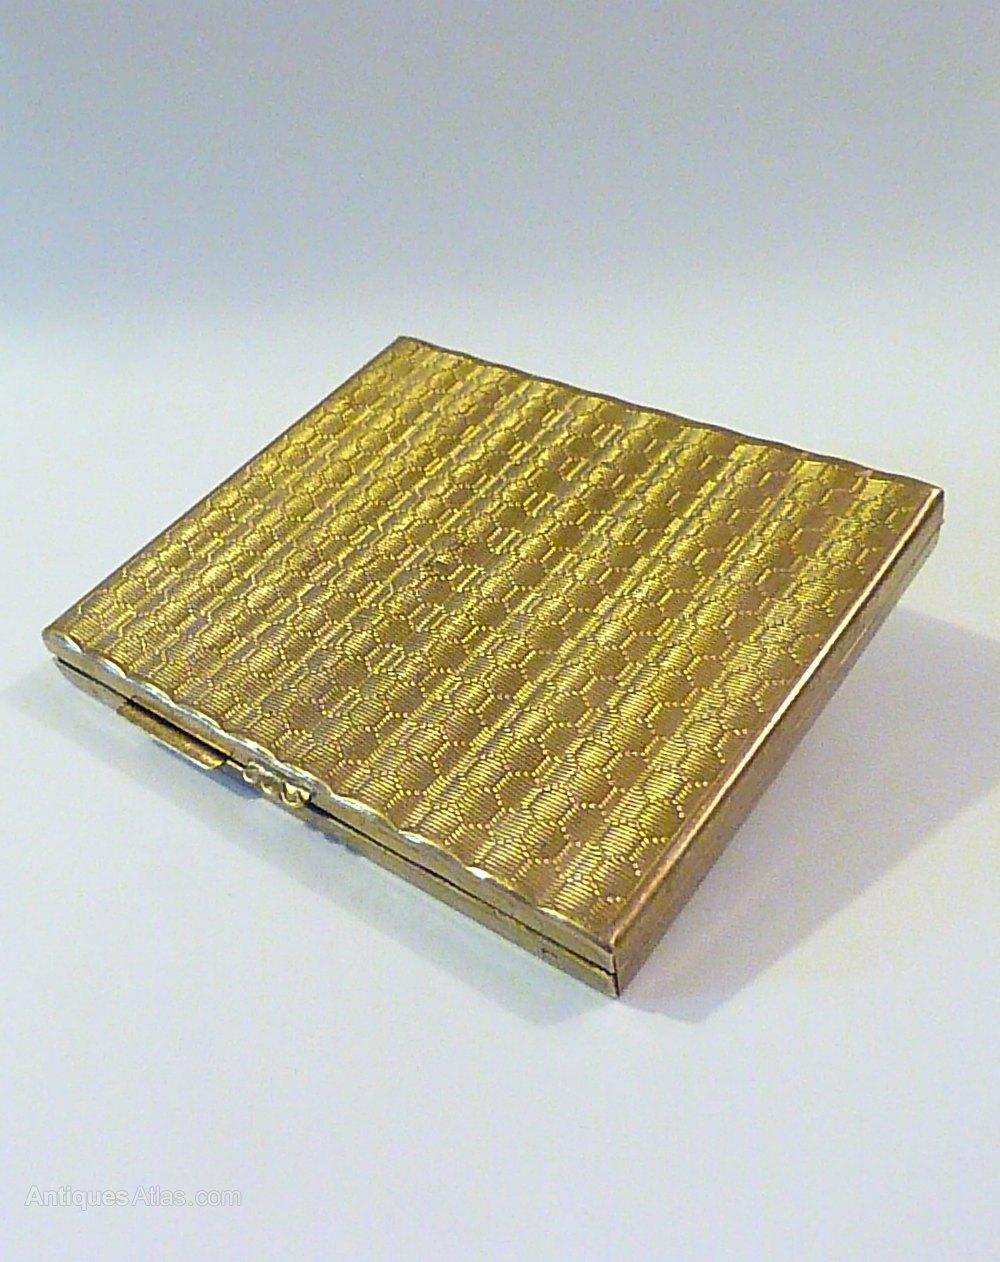 Antiques Atlas Rare Gwenda Cigarette Case Compact